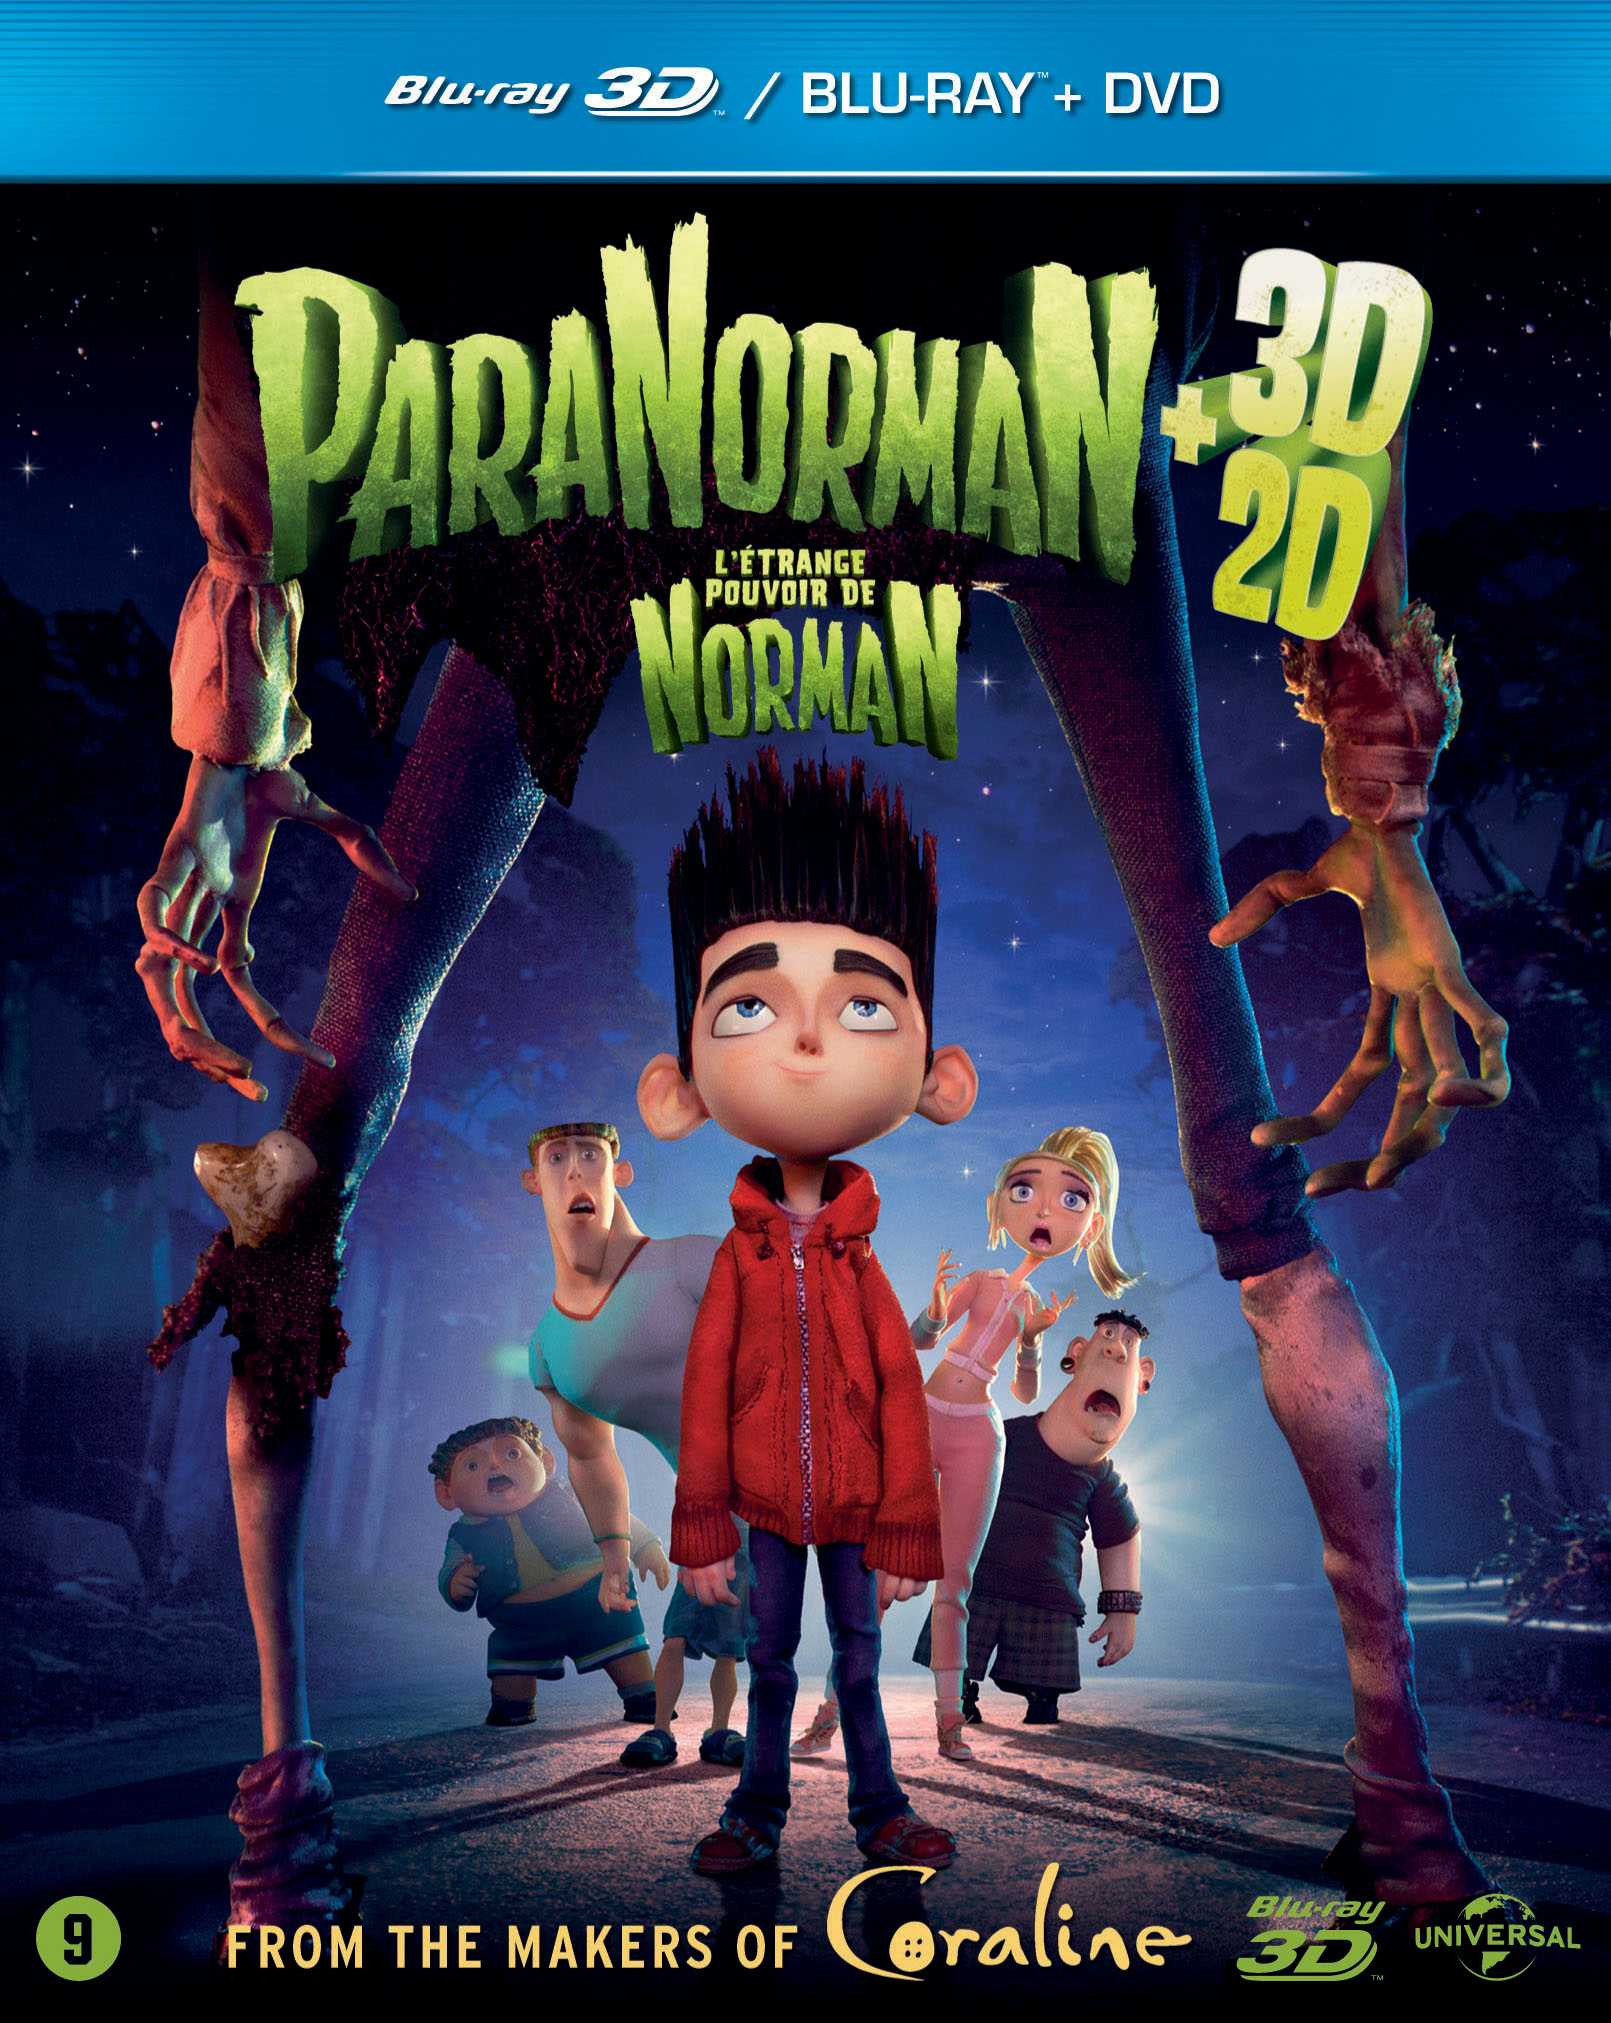 ParaNorman Blu-ray set